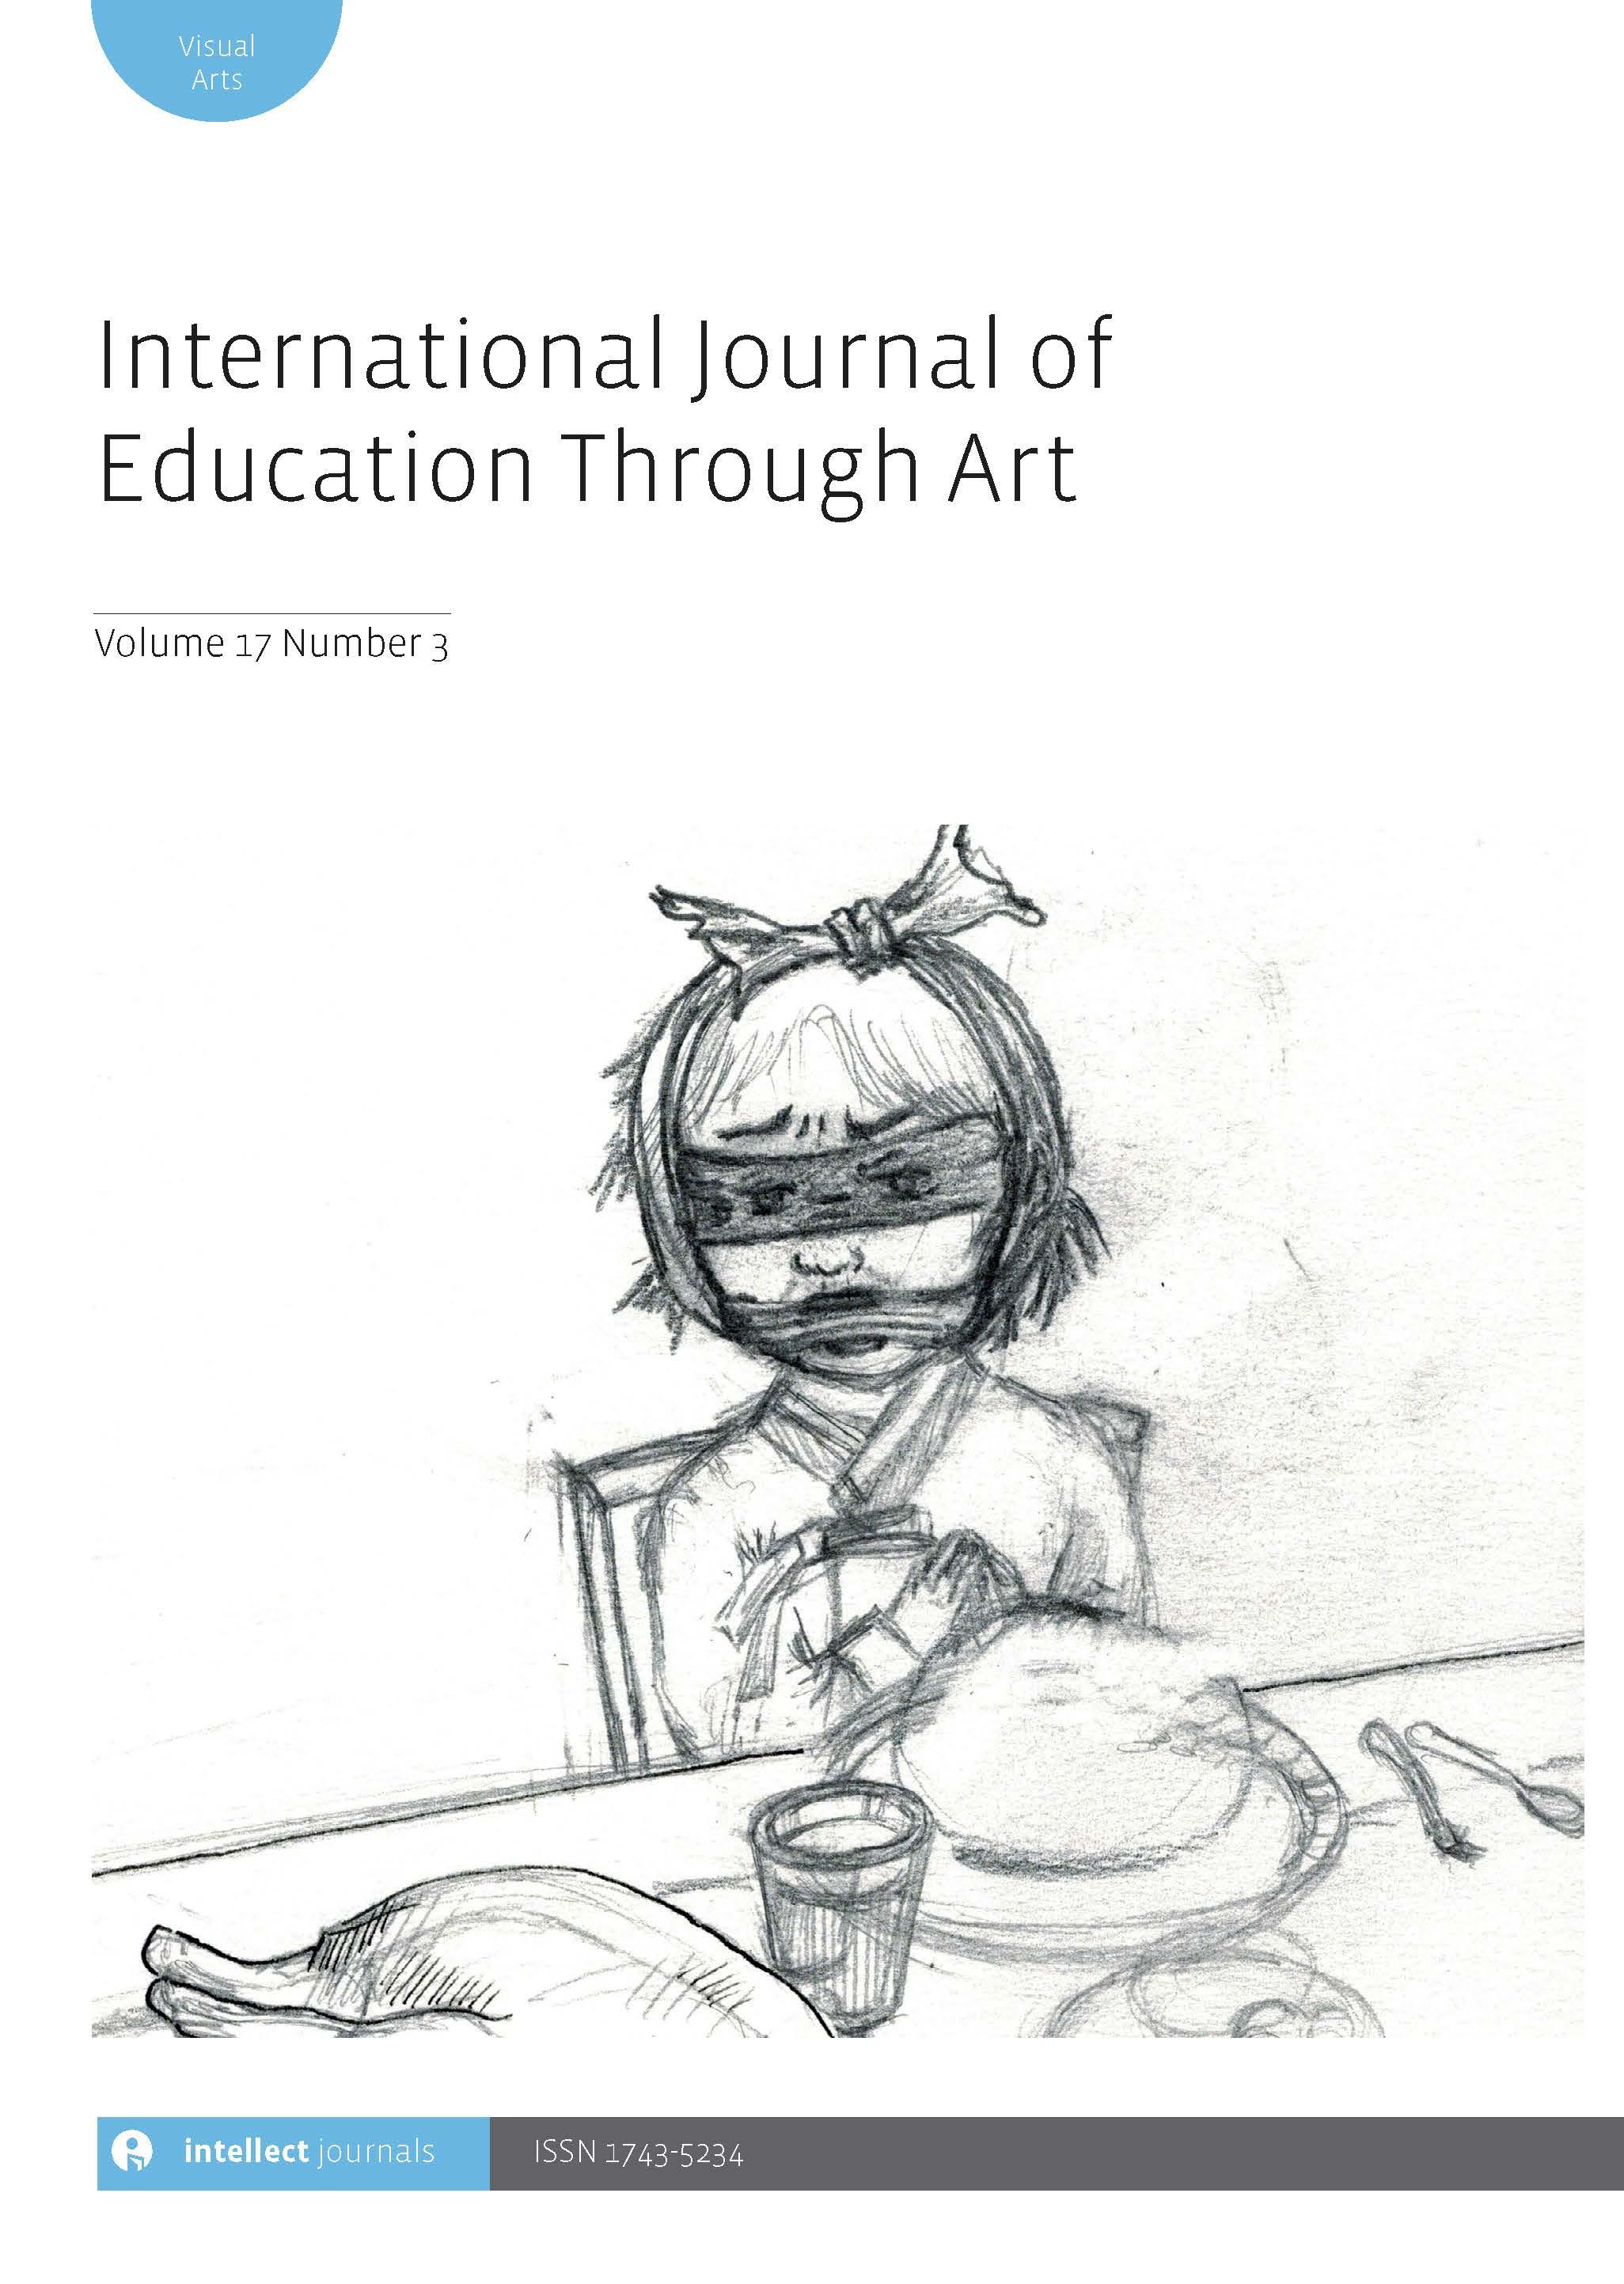 View Vol. 17 No. 3 (2021): International Journal of Education Through Art